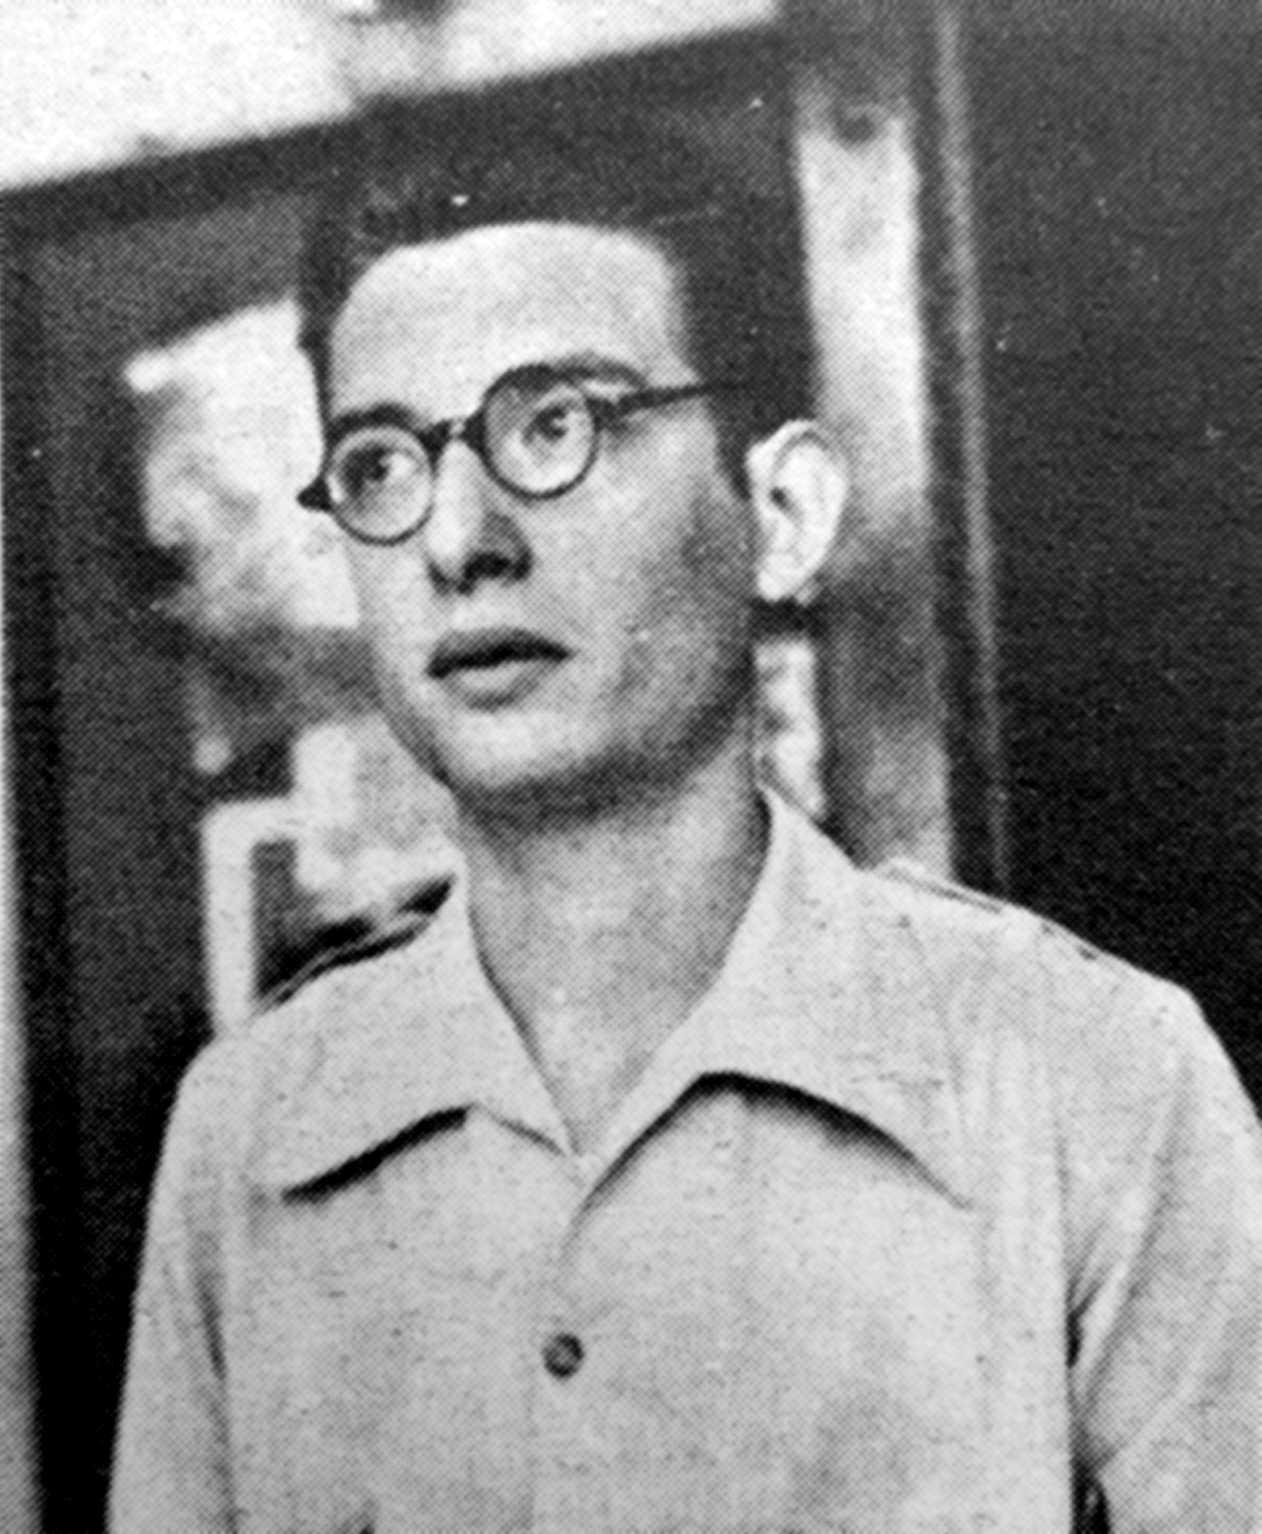 José Expósito Leiva